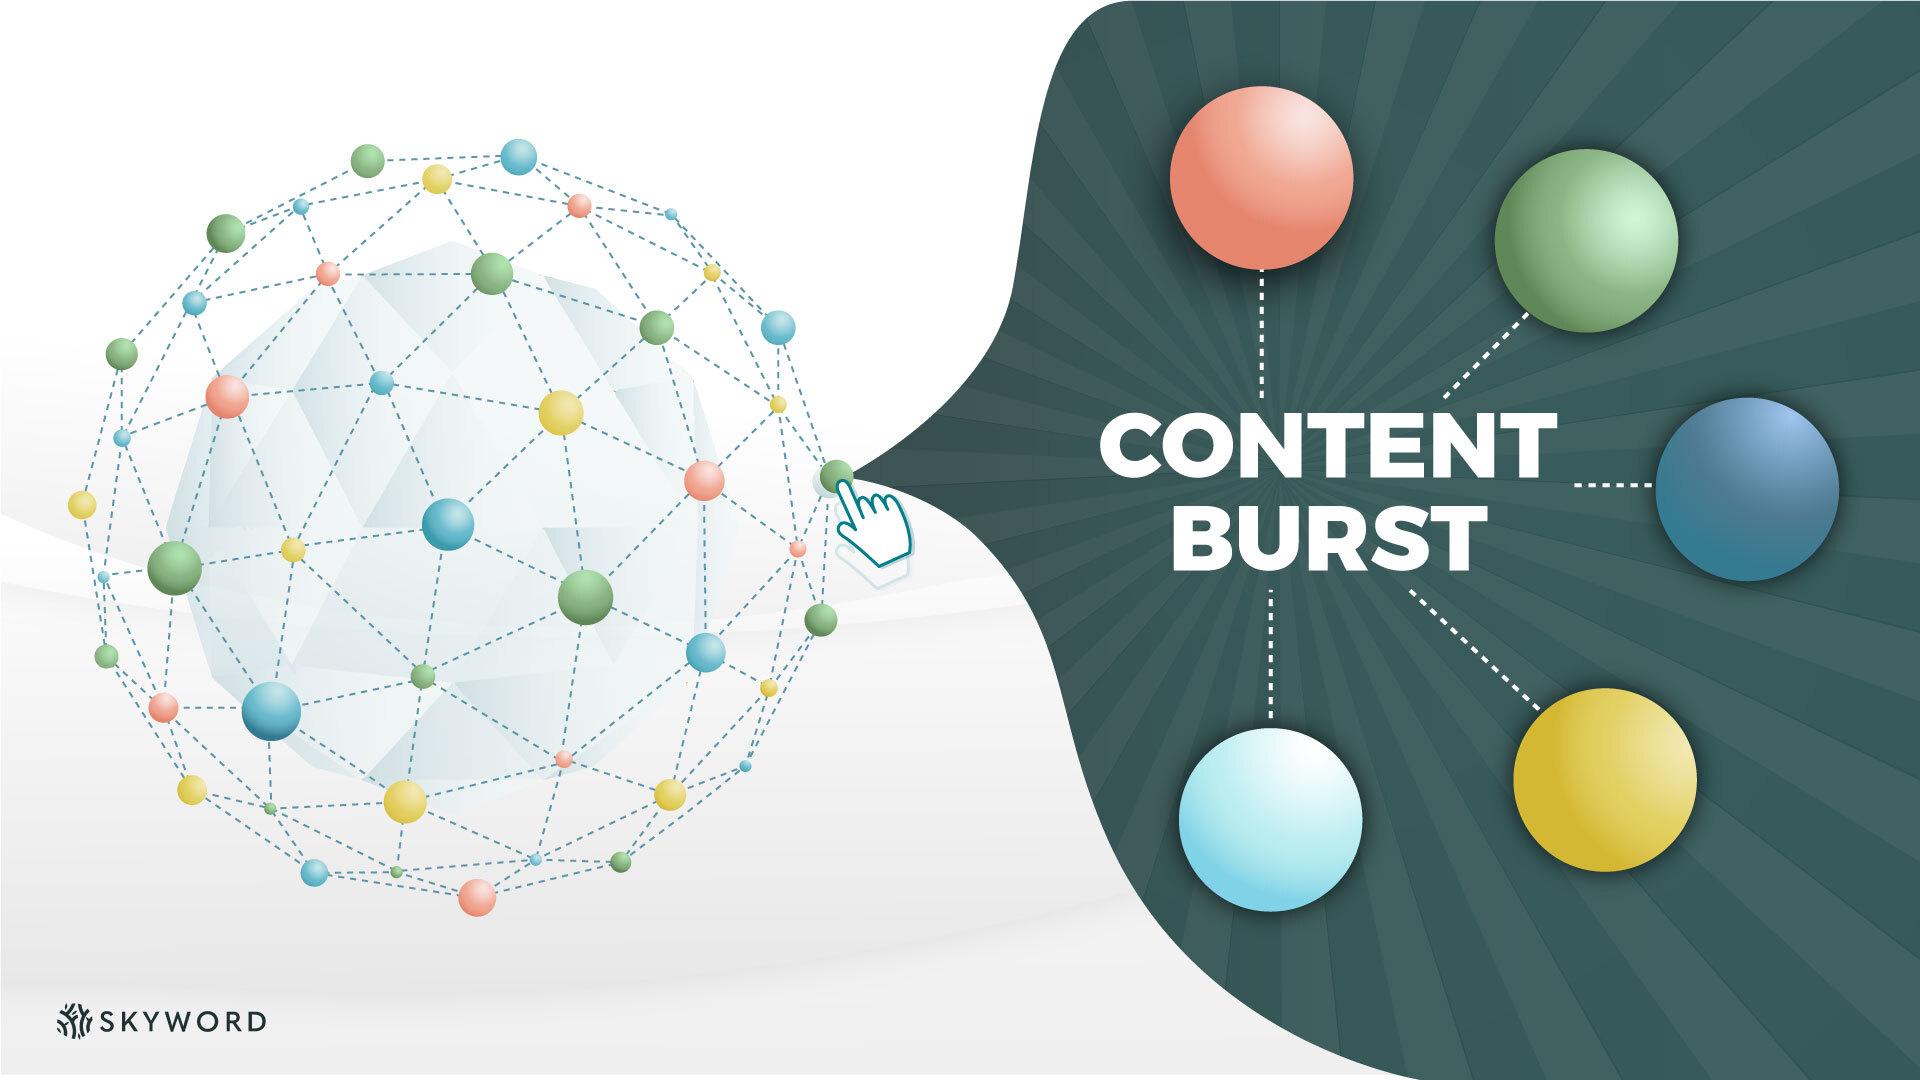 an ecosystem feeds content bursts